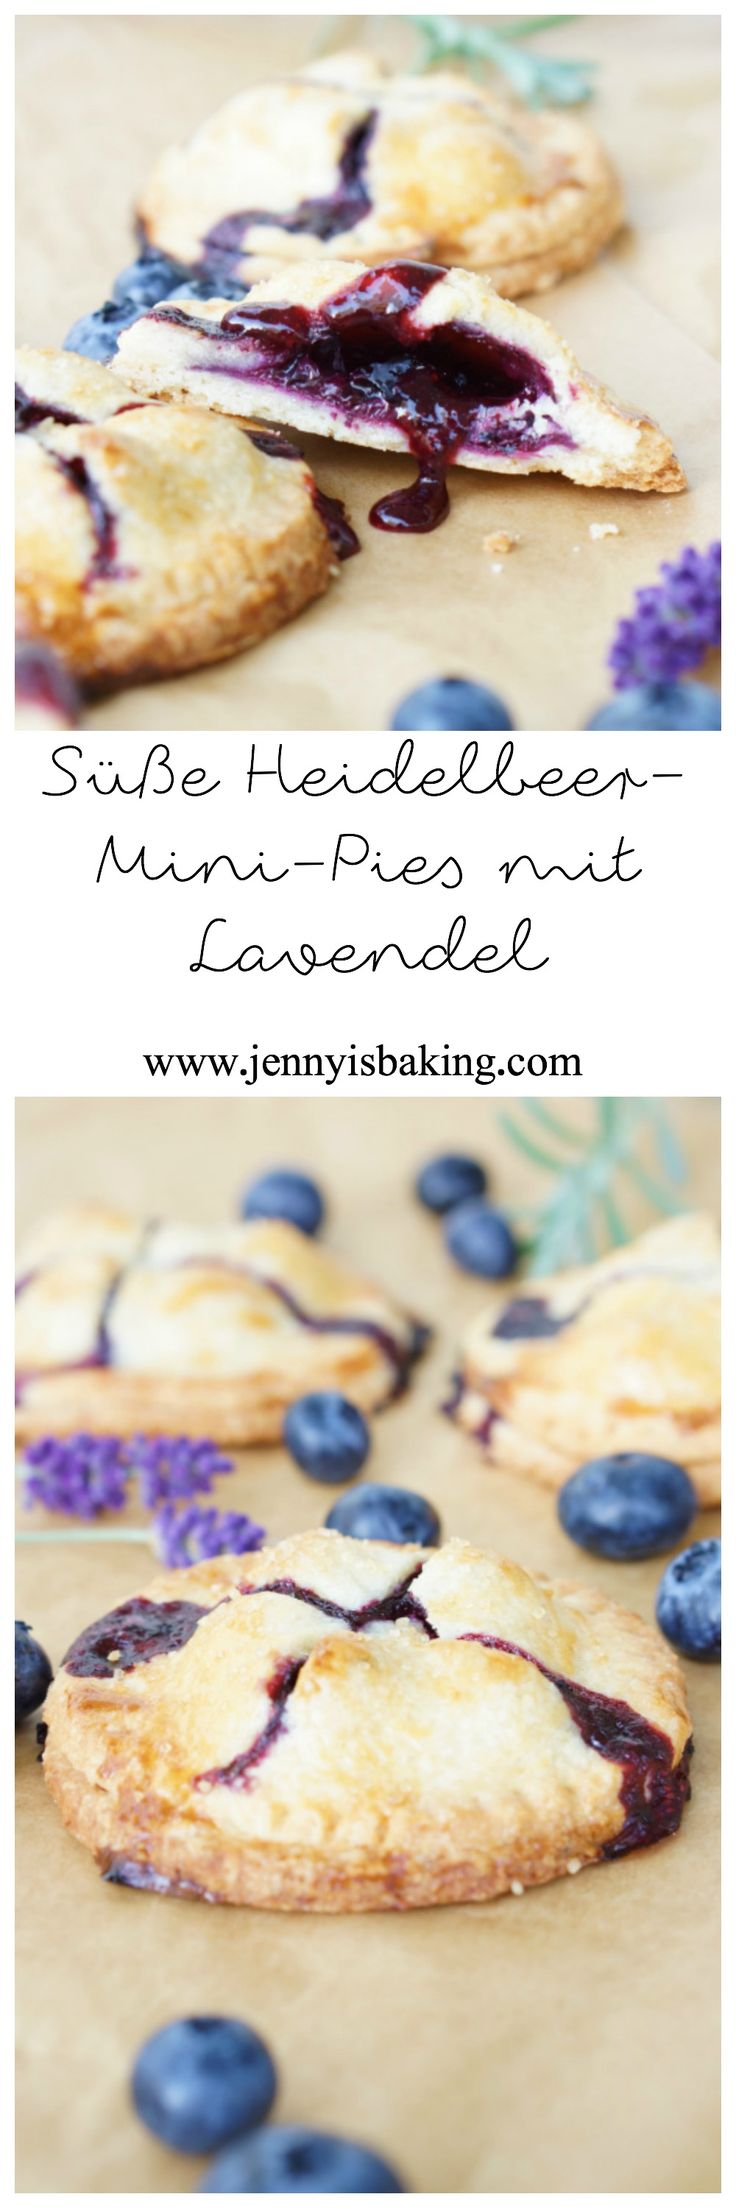 Süße Heidelbeer-Mini-Pies mit Lavendel, genau richtig!